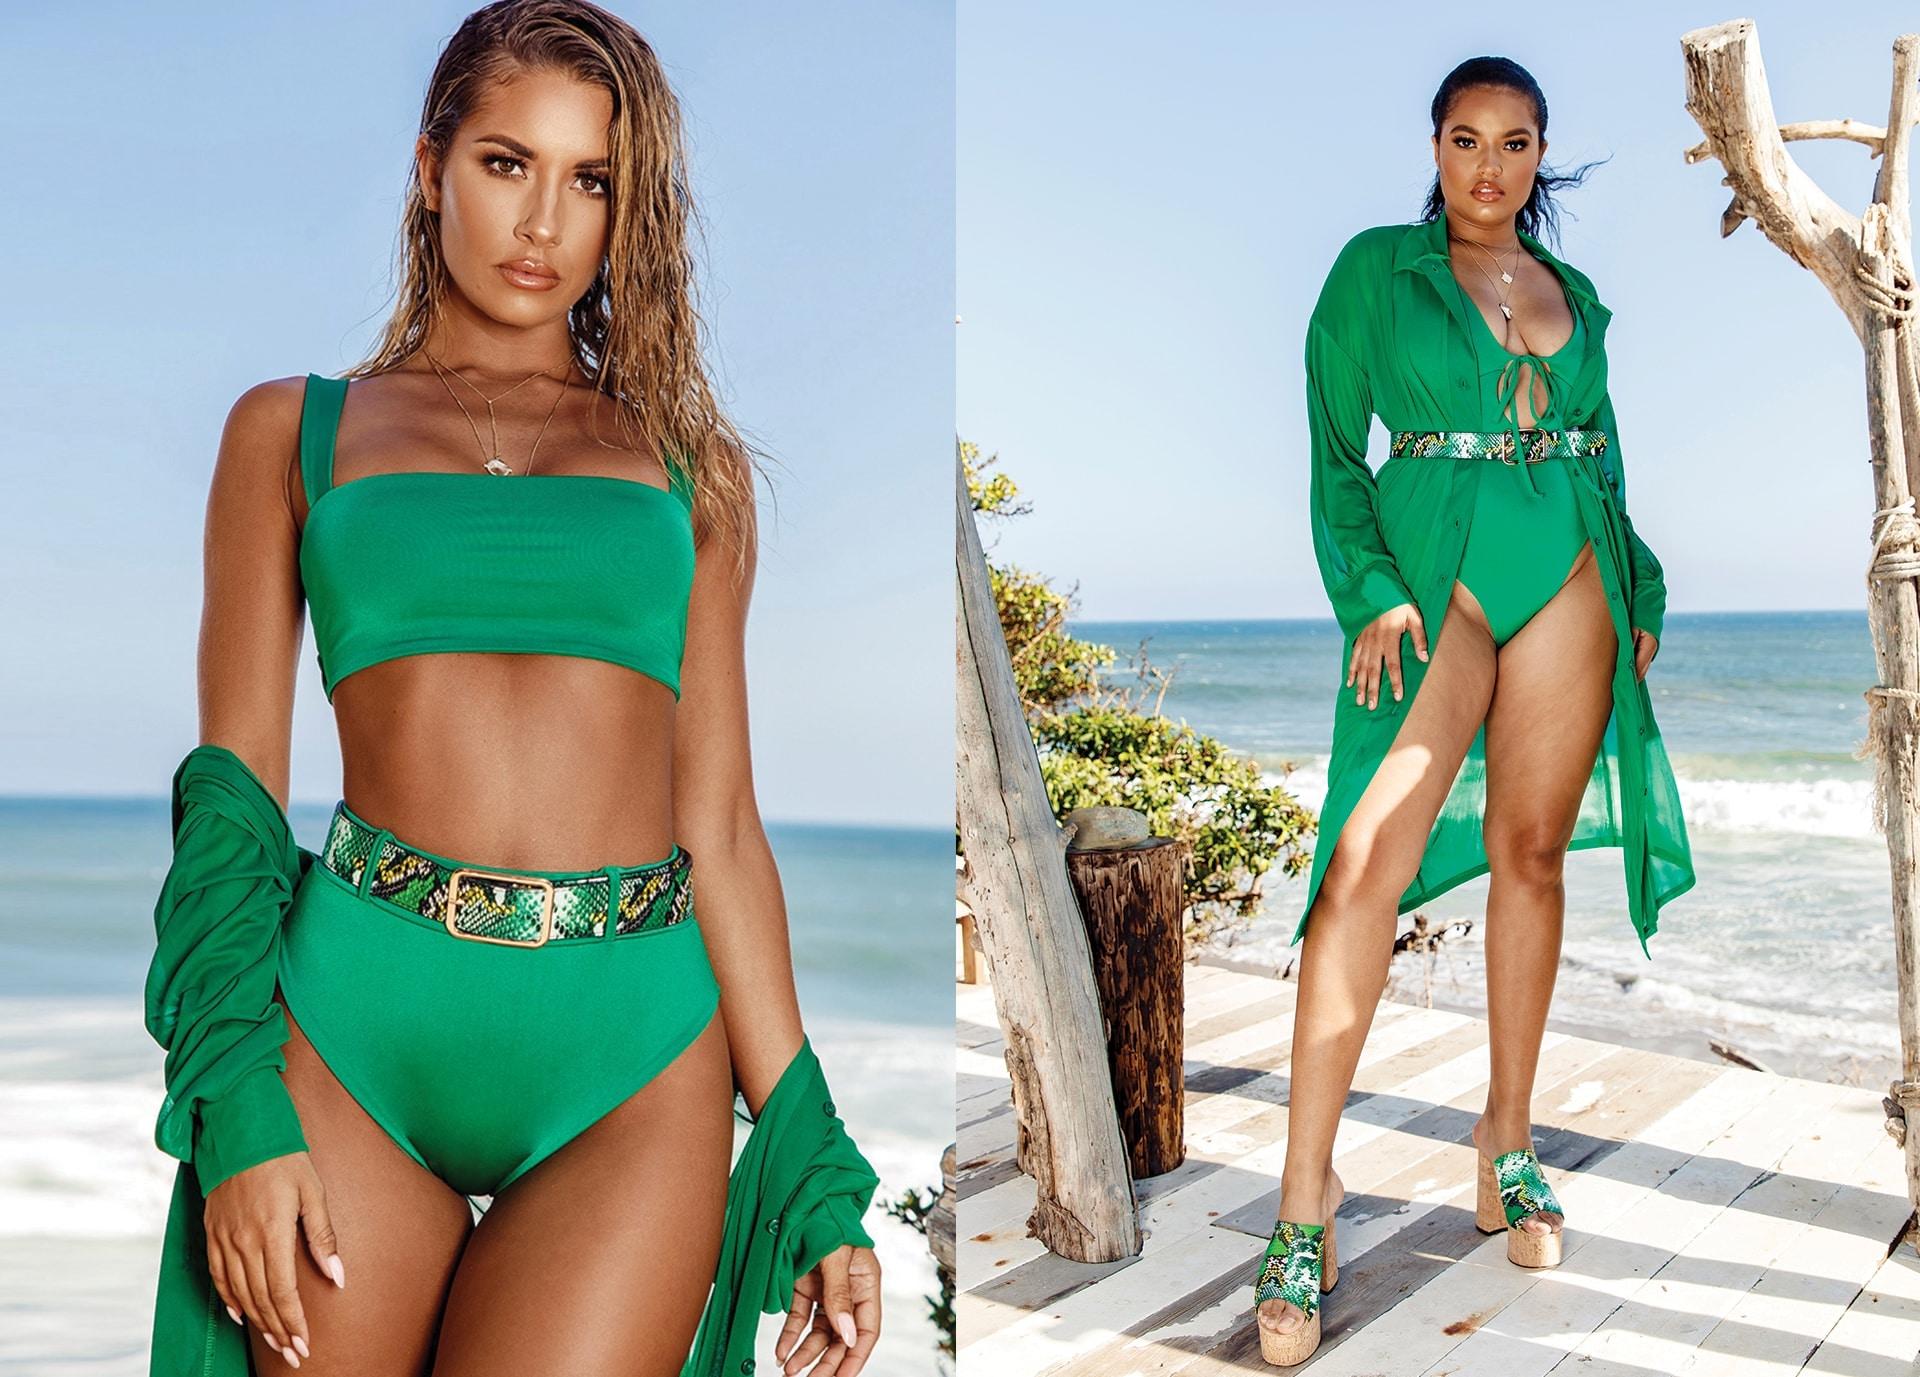 Green Bikini Top and Bottoms , Green Bathing Suit